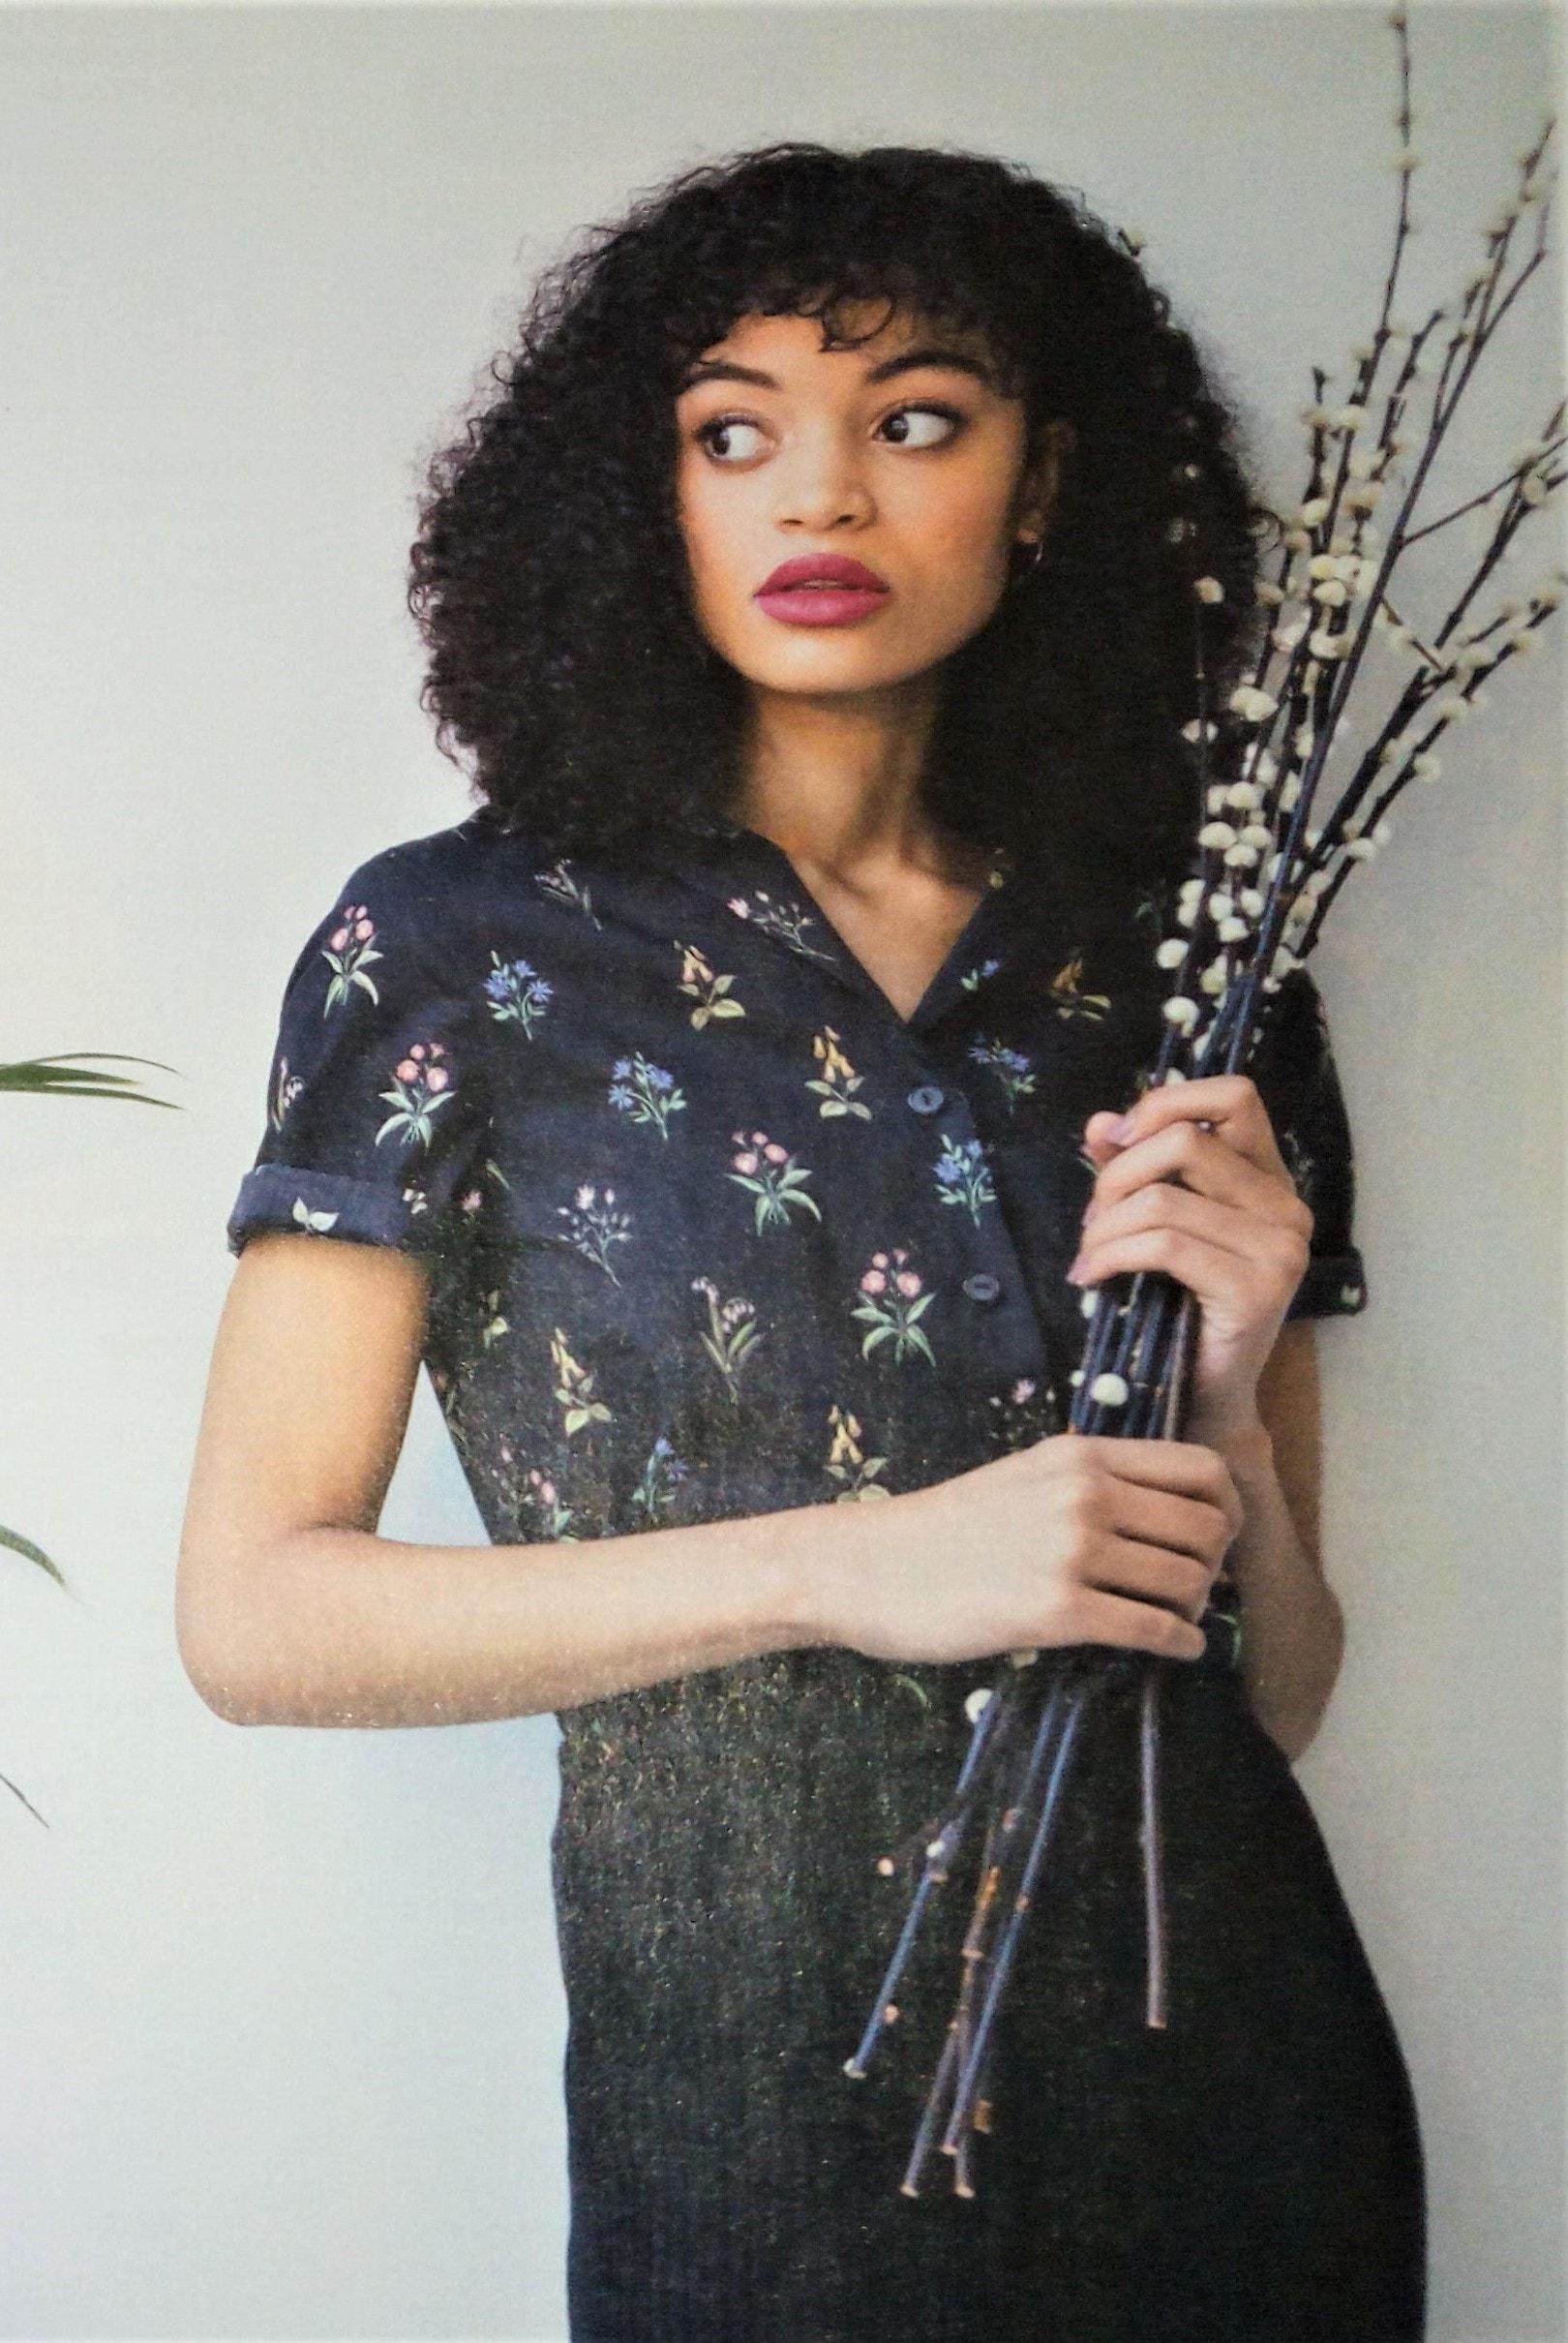 La-Maison-Victor-edition-2-Mars-avril-2018 (28)